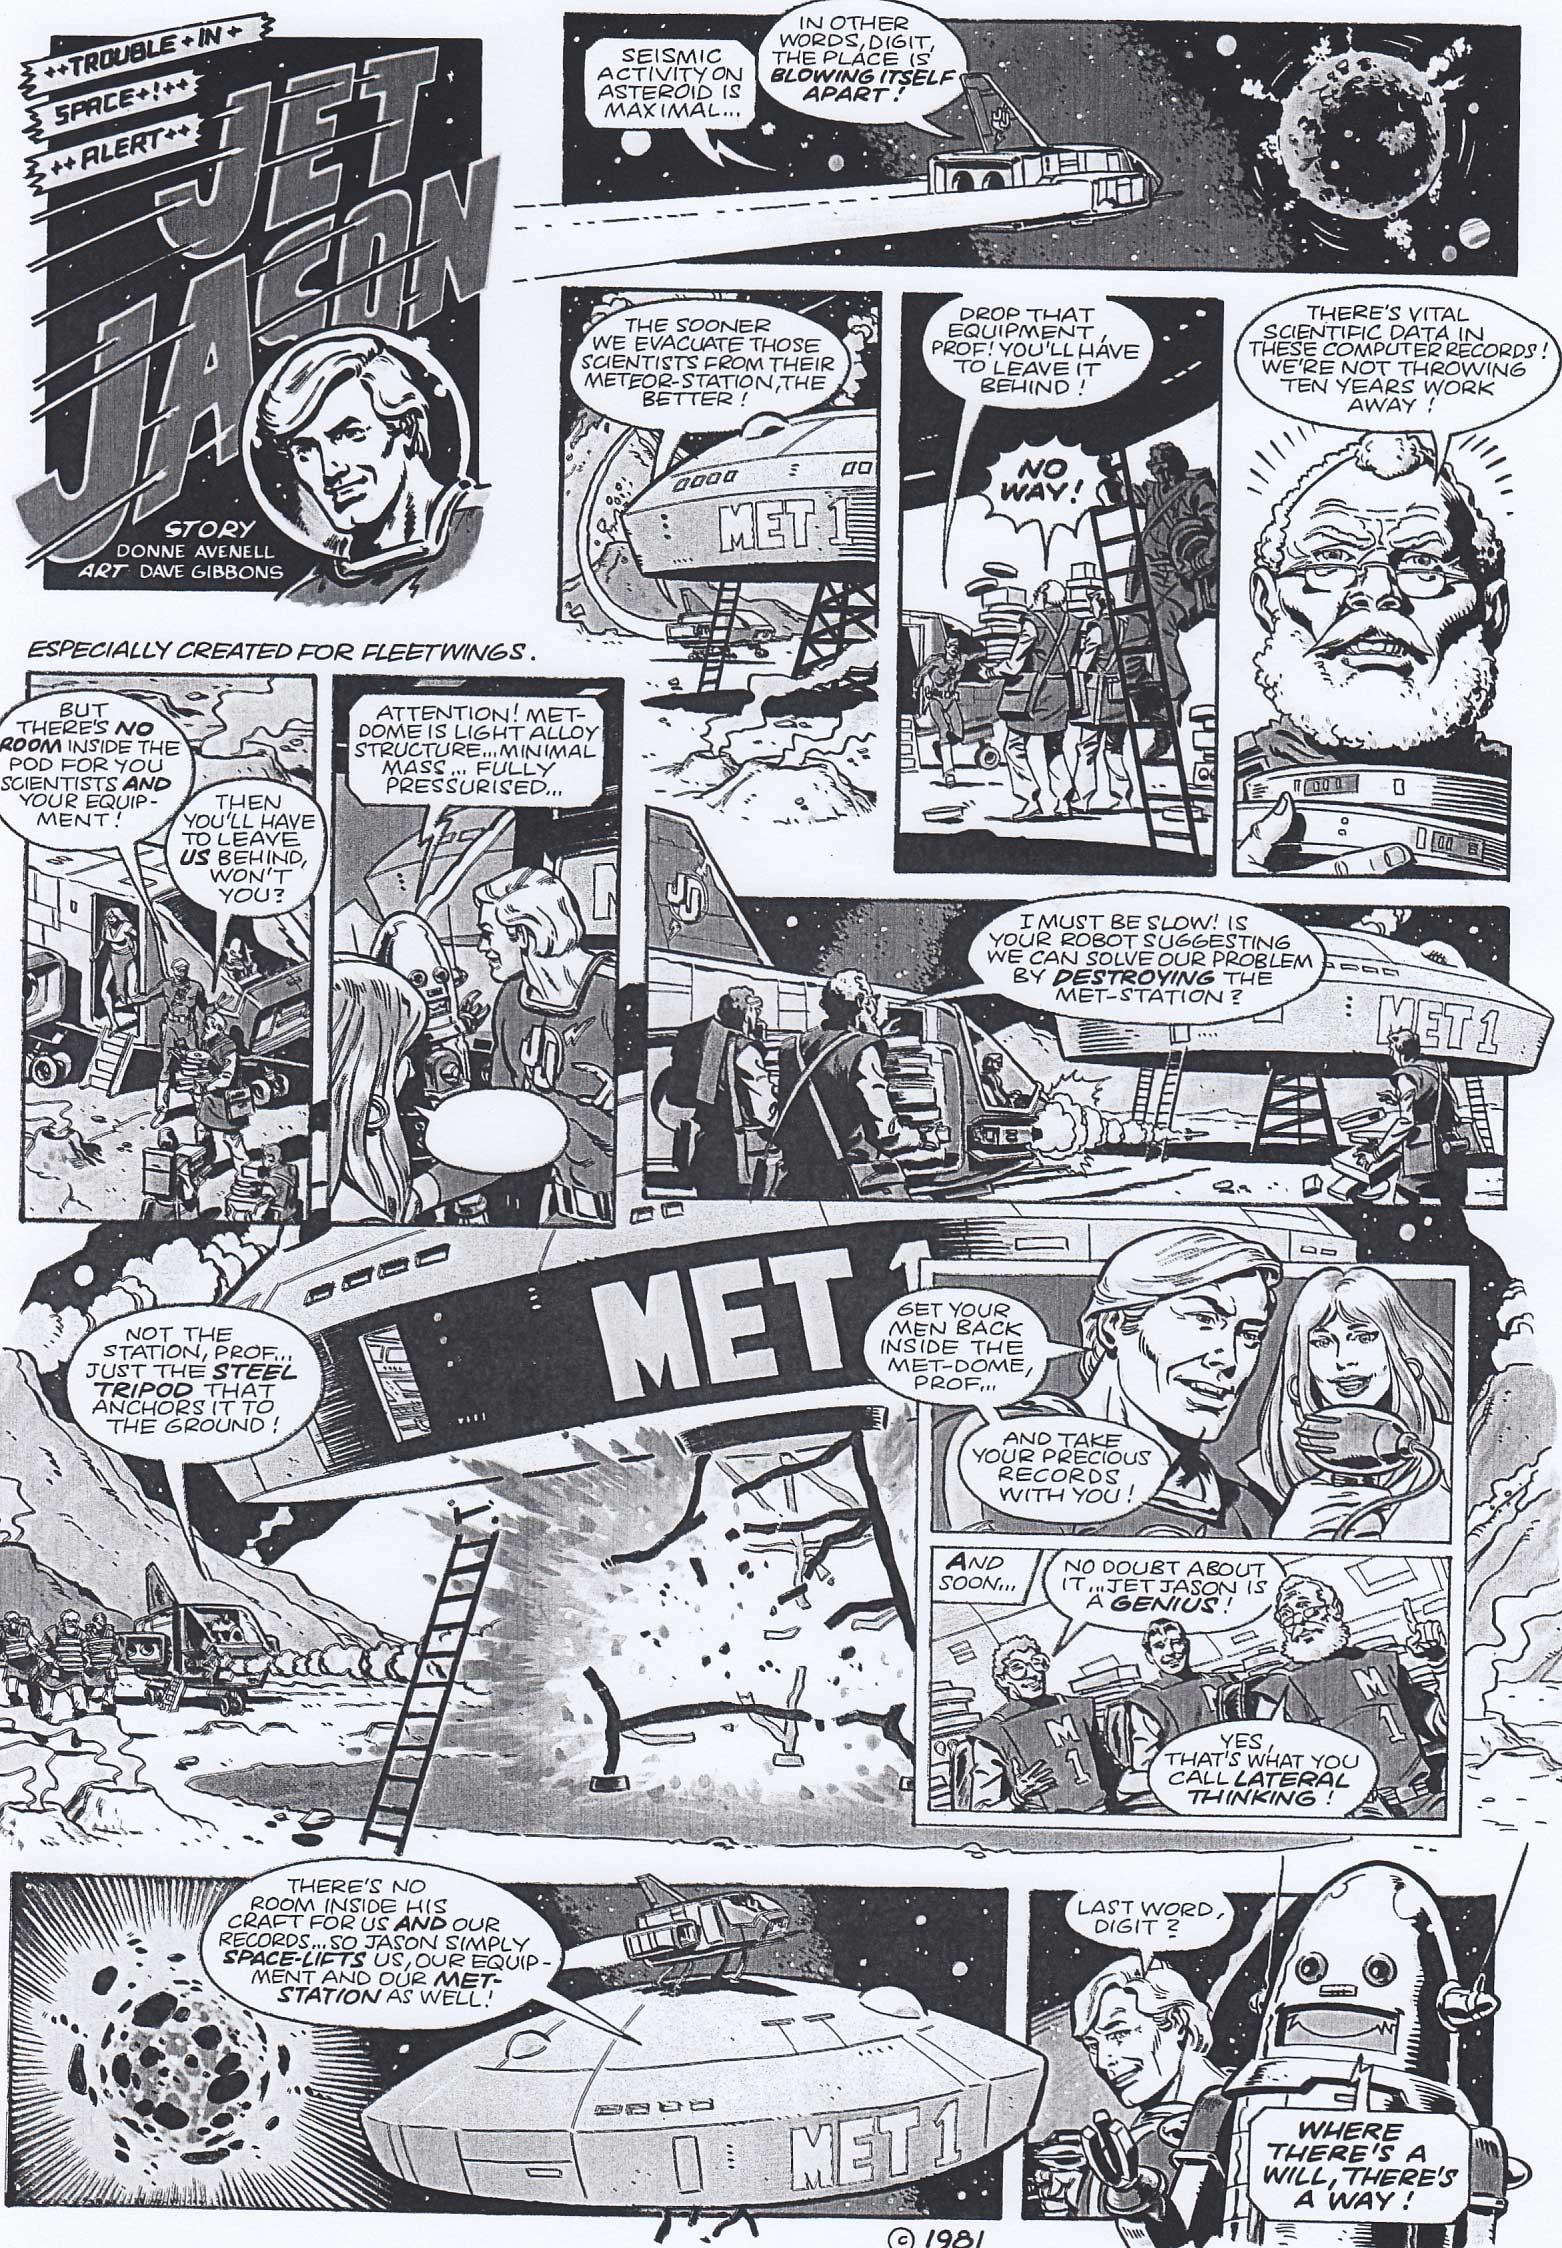 Fleetwings - Spring 1981 - Jet Jason Episode 6